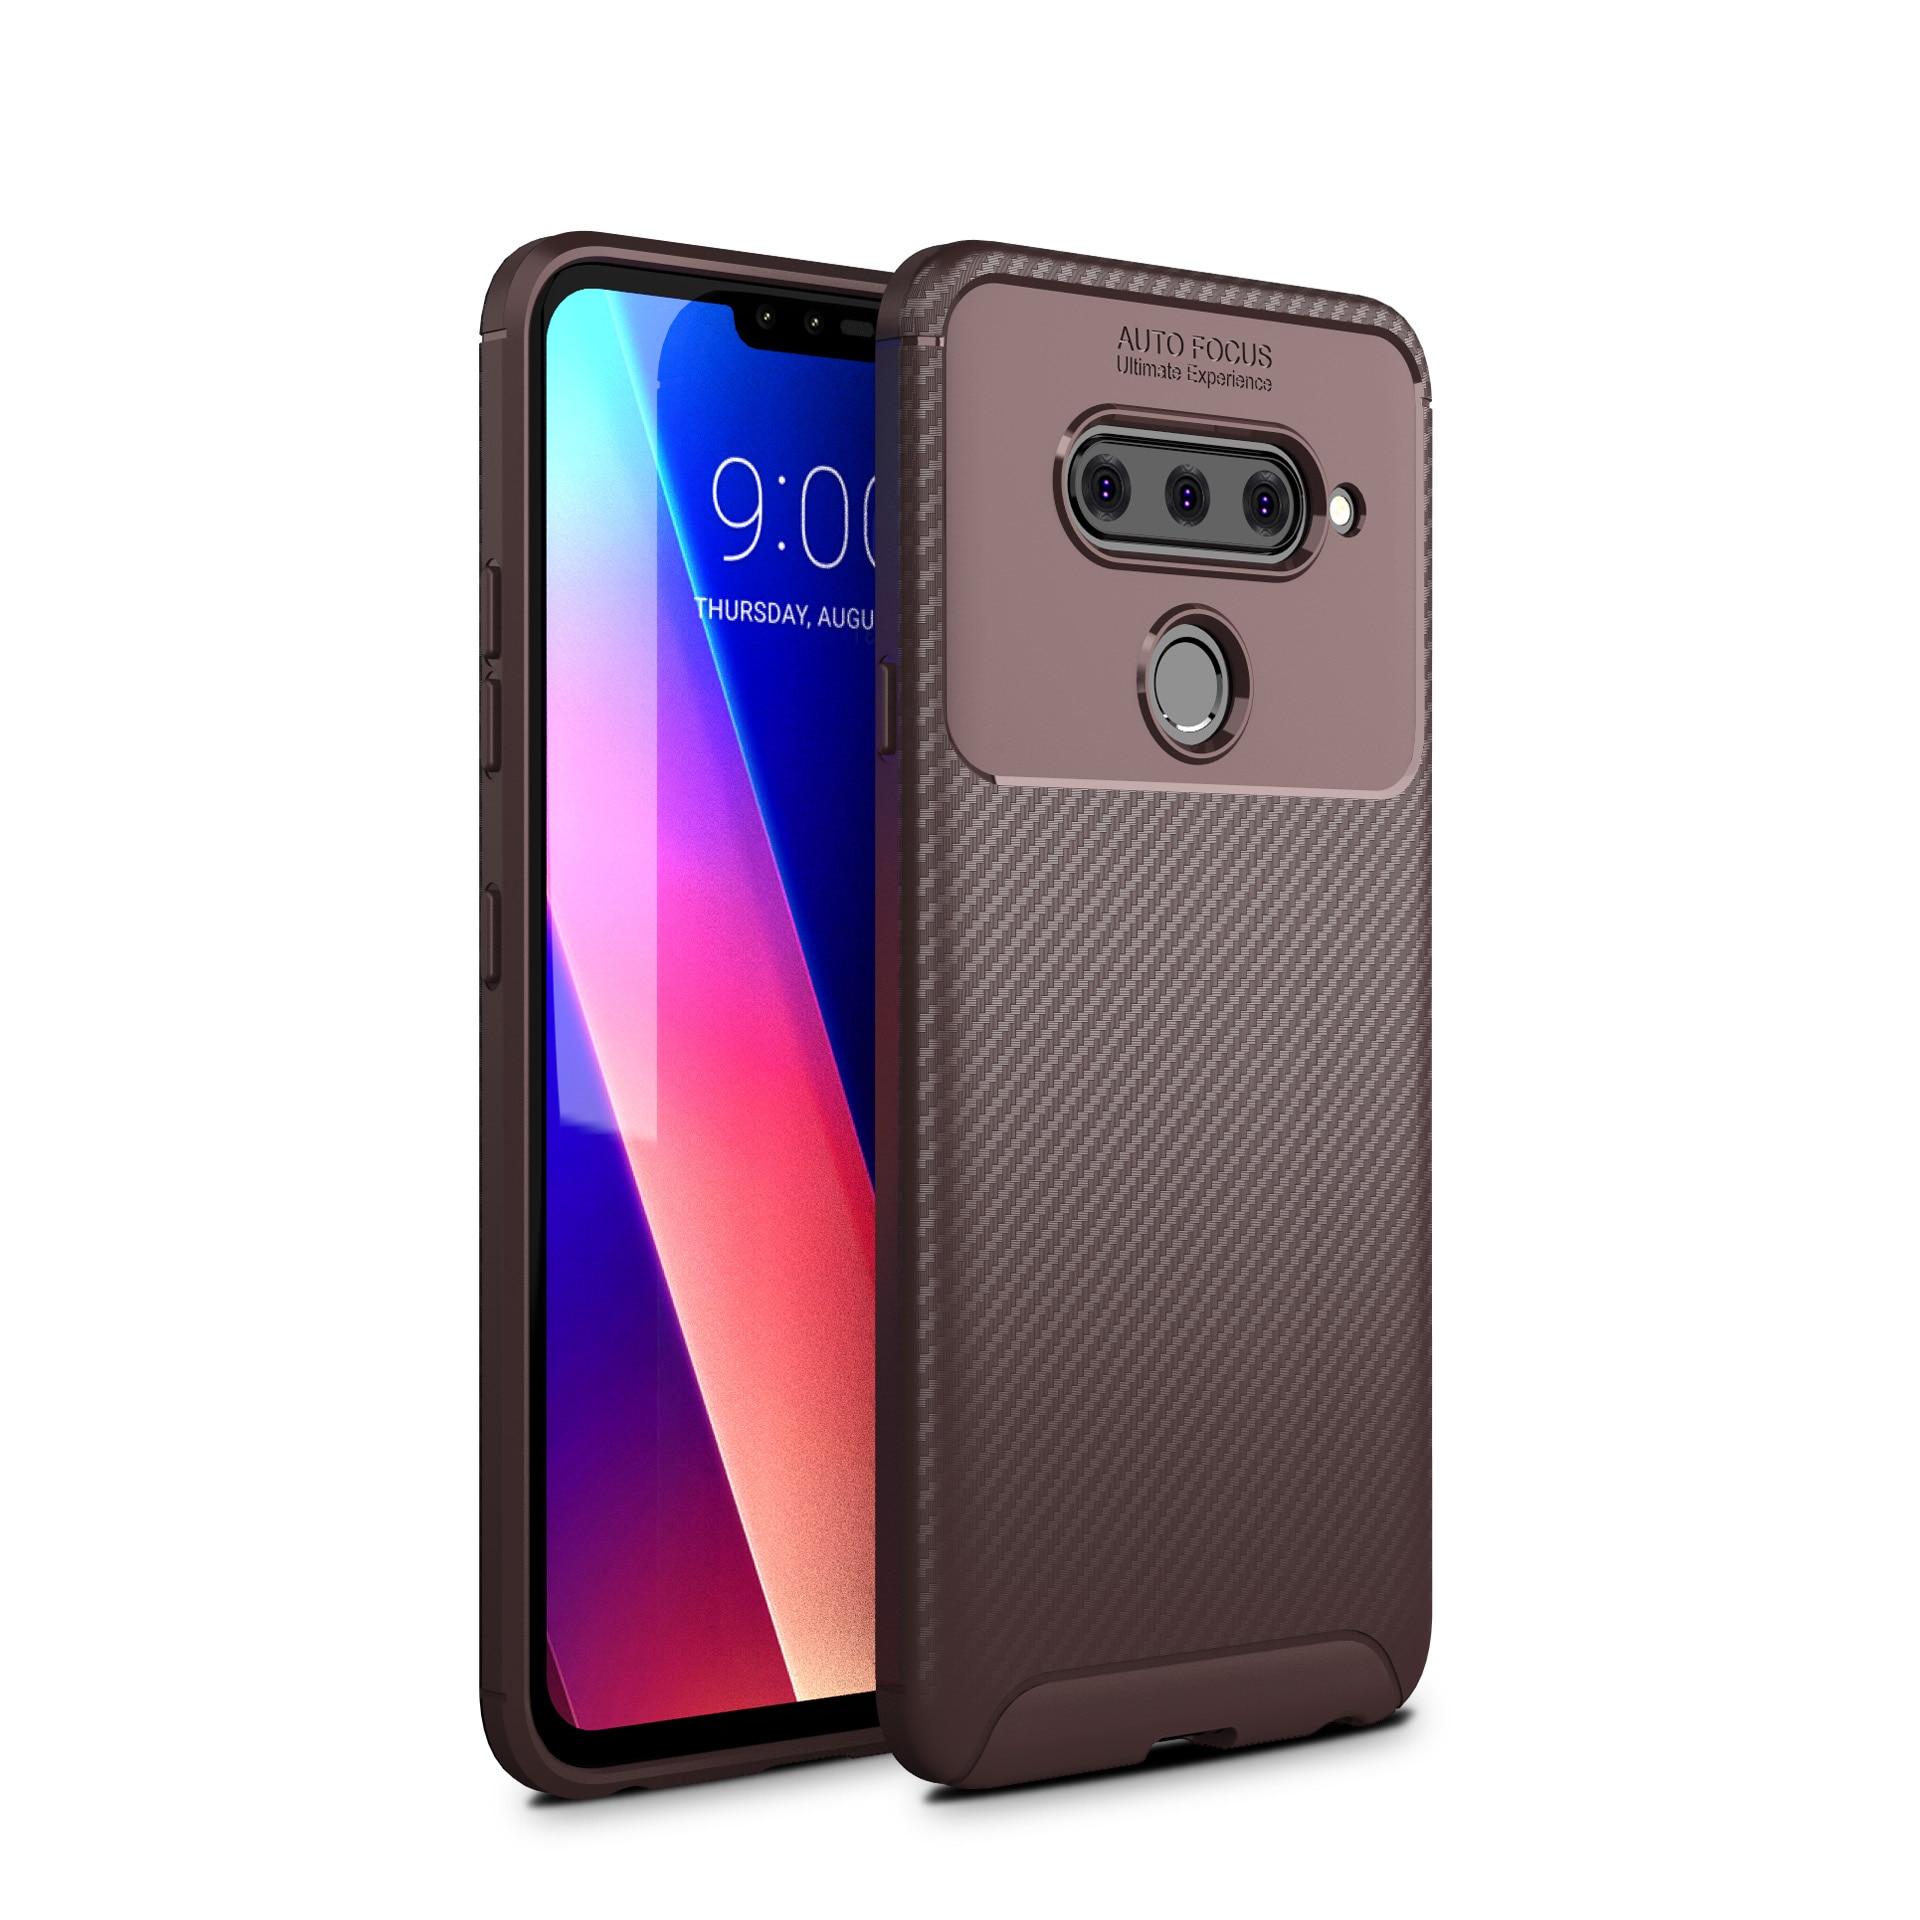 Brushed Texture Case For LG V40 Phone Case Soft TPU Back Cover Coque For LG V40